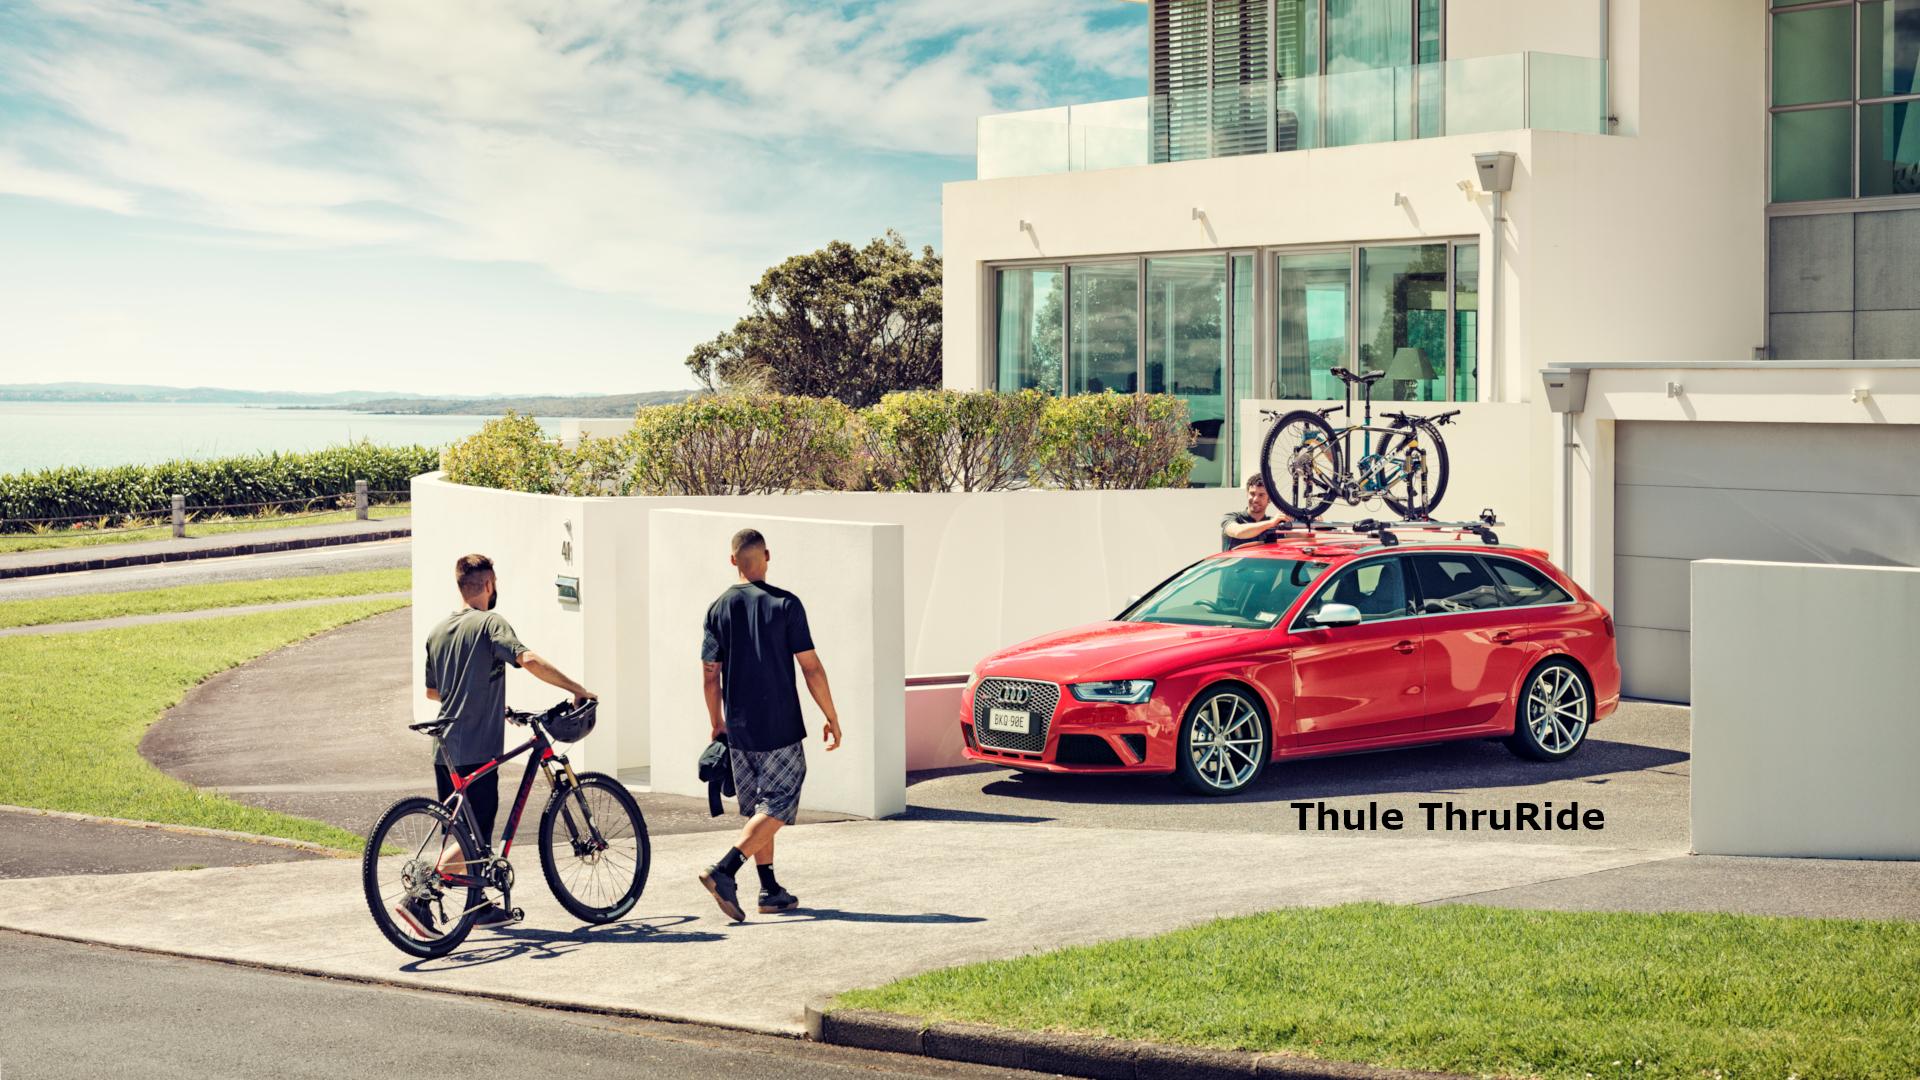 Thule bike rack, thule bike racks